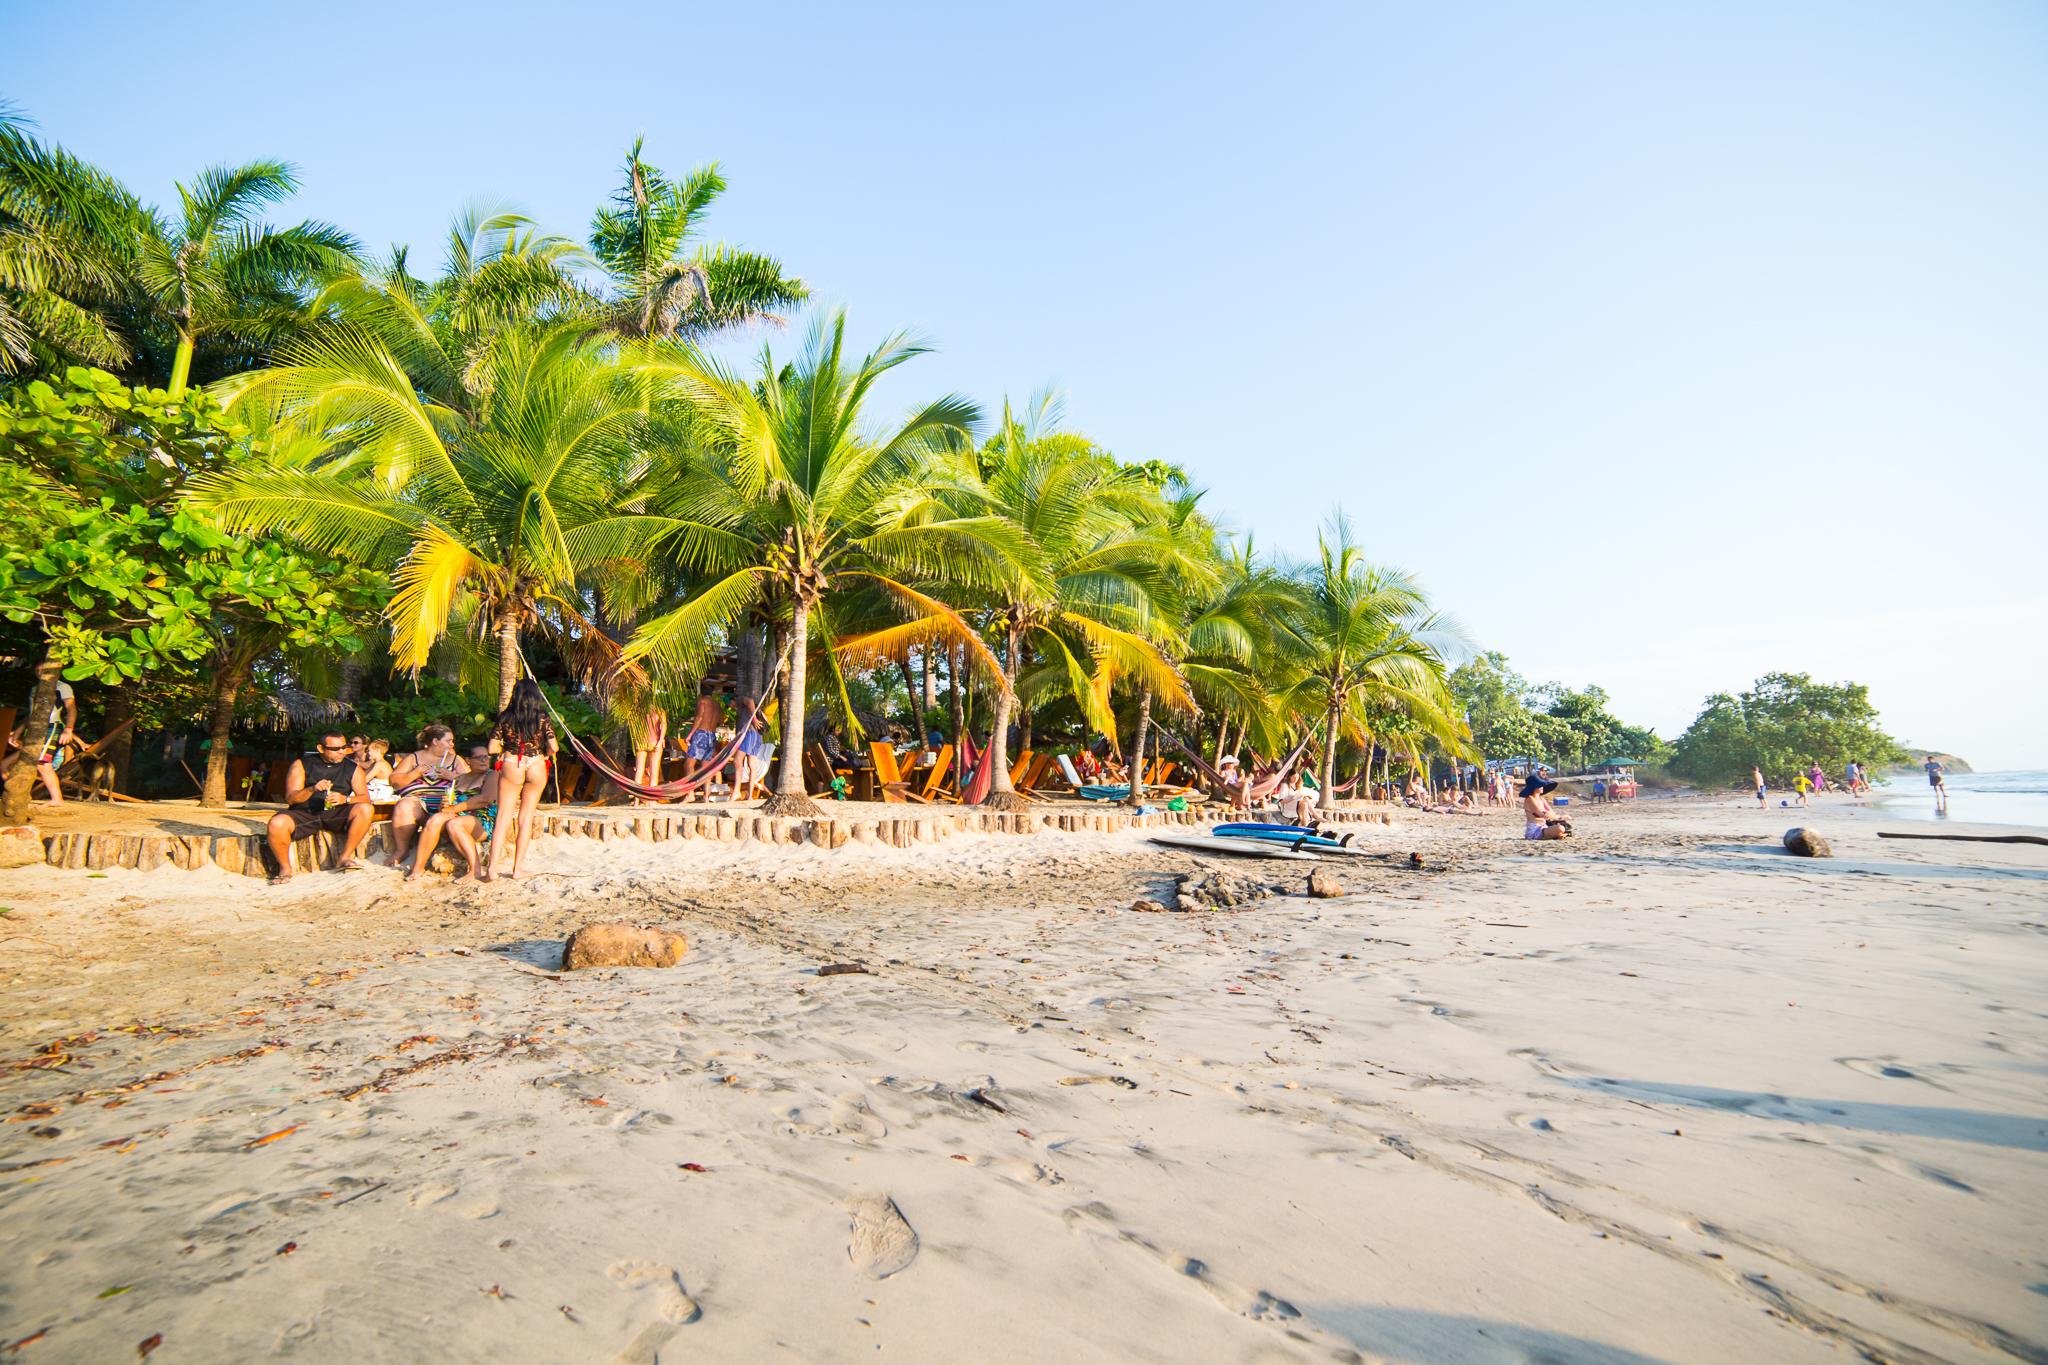 costarica-78-2.jpg